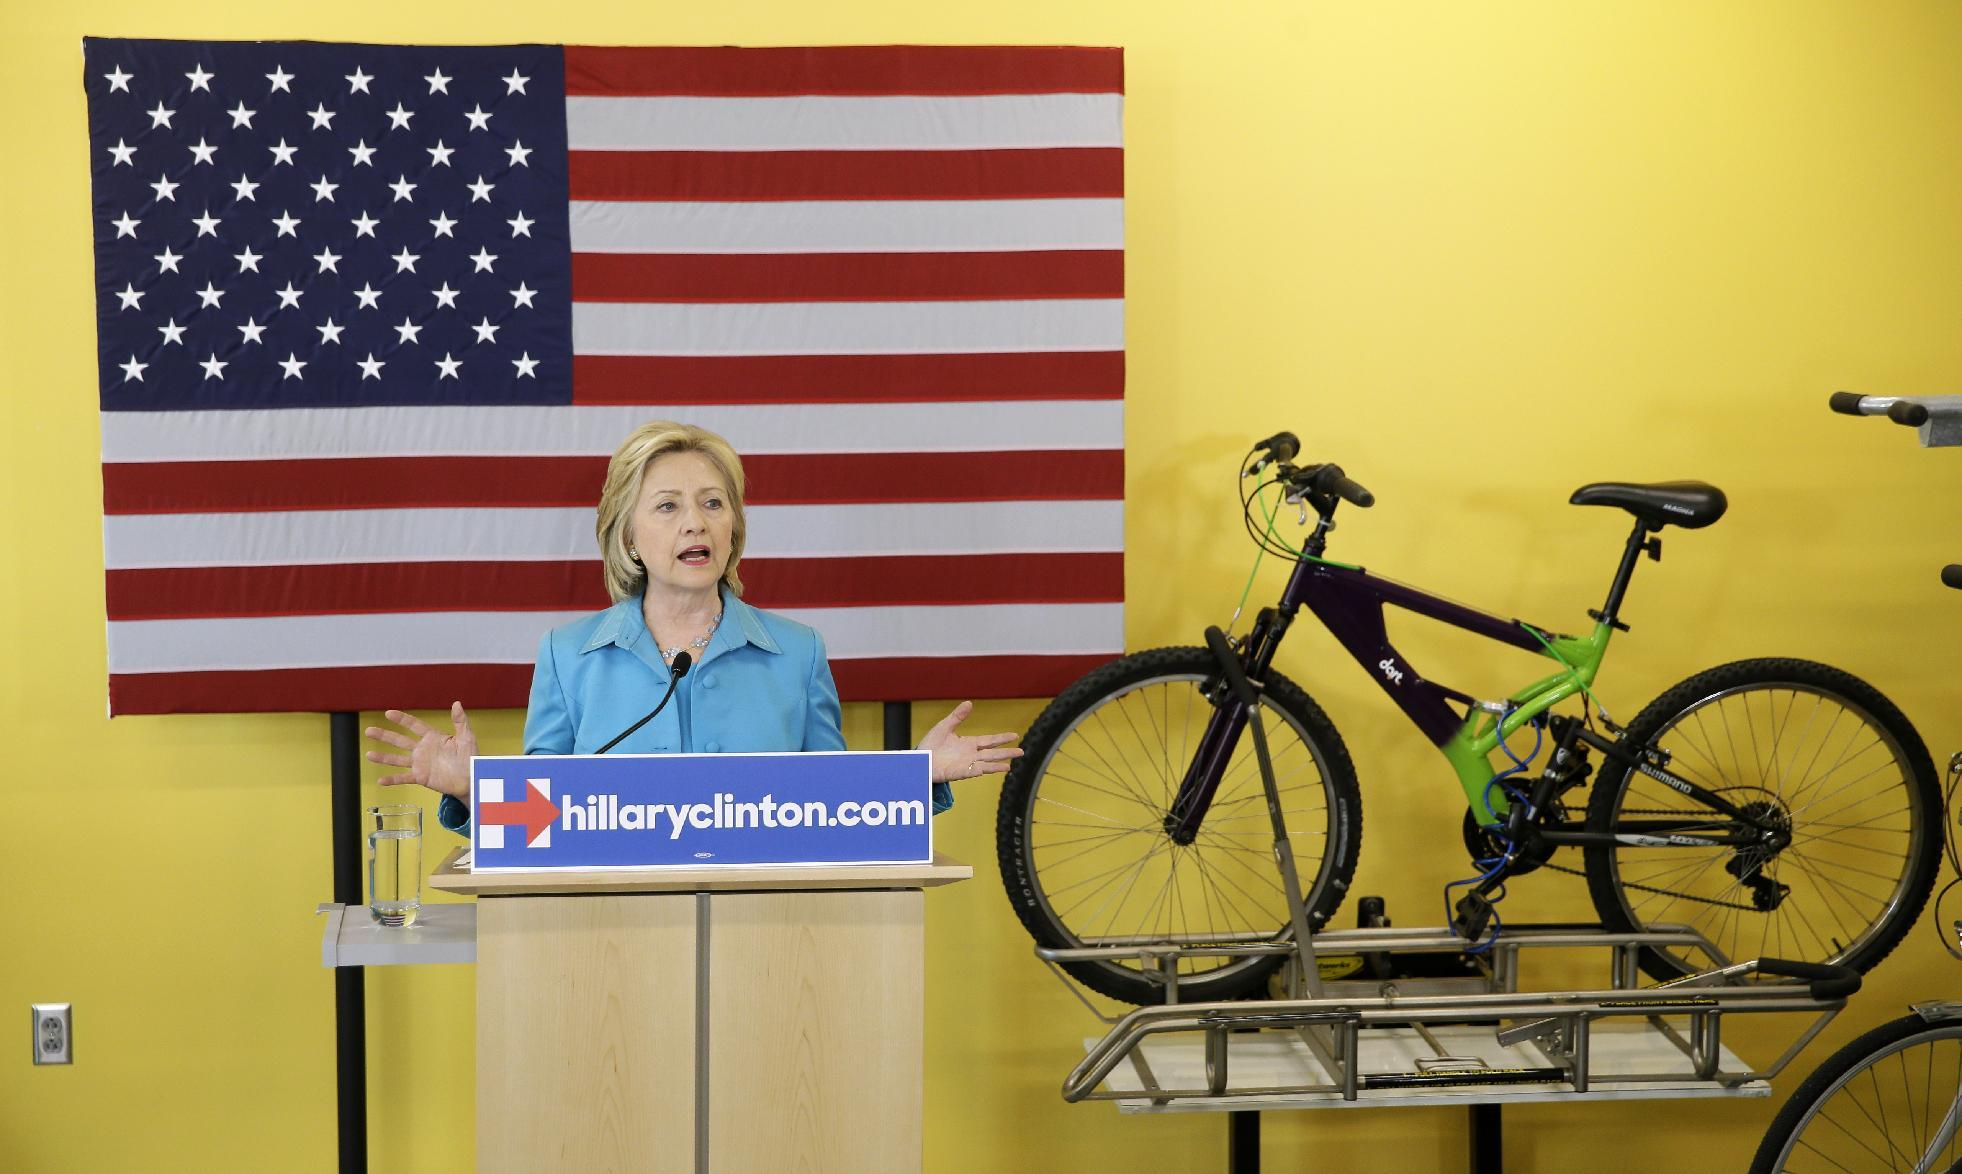 Clinton aims high in green energy plan